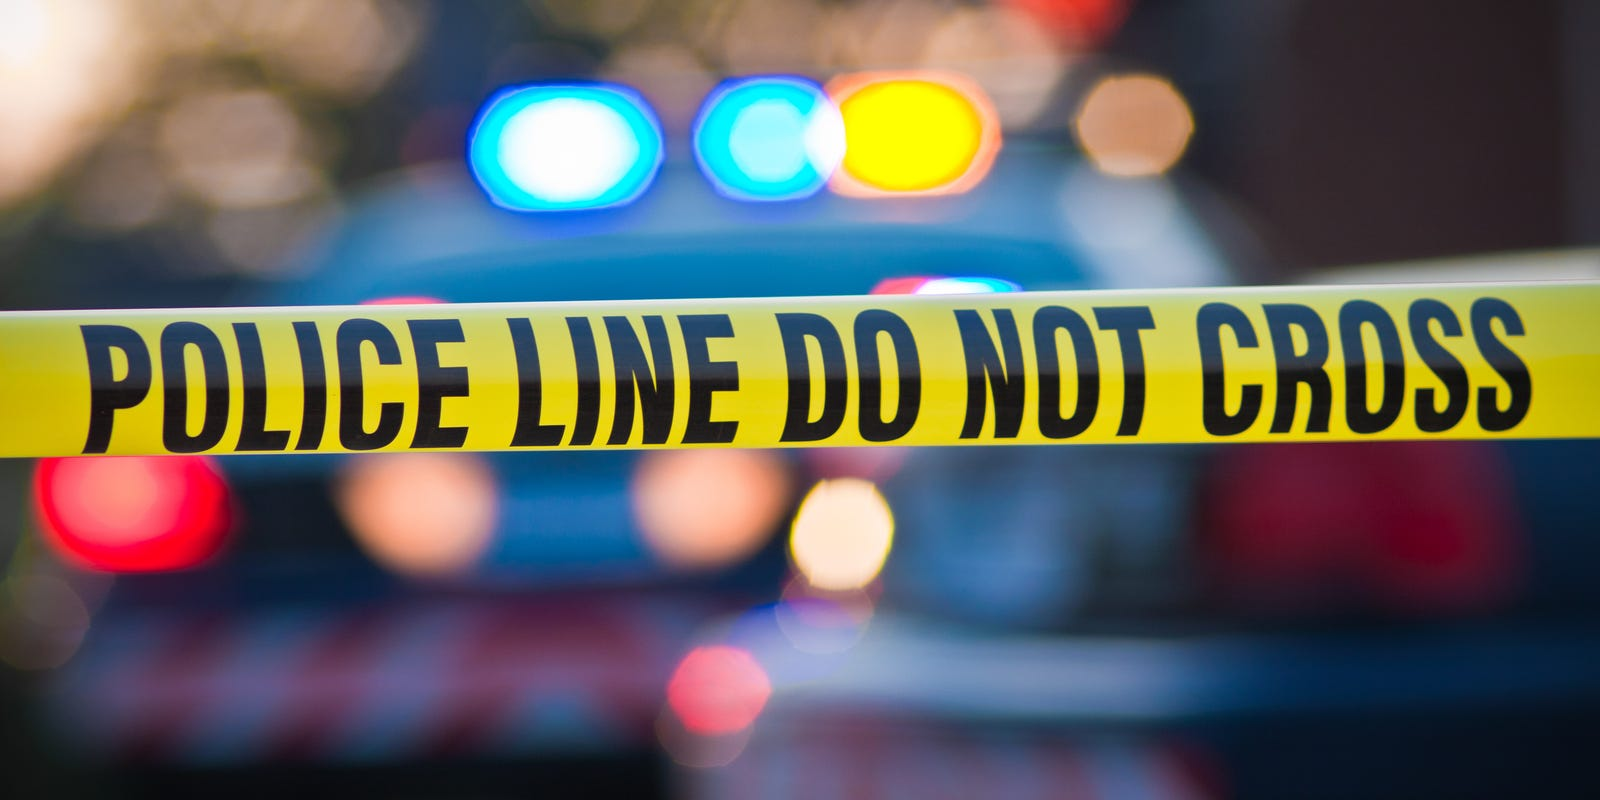 Man sentenced in go-kart crash that killed daughter, 4